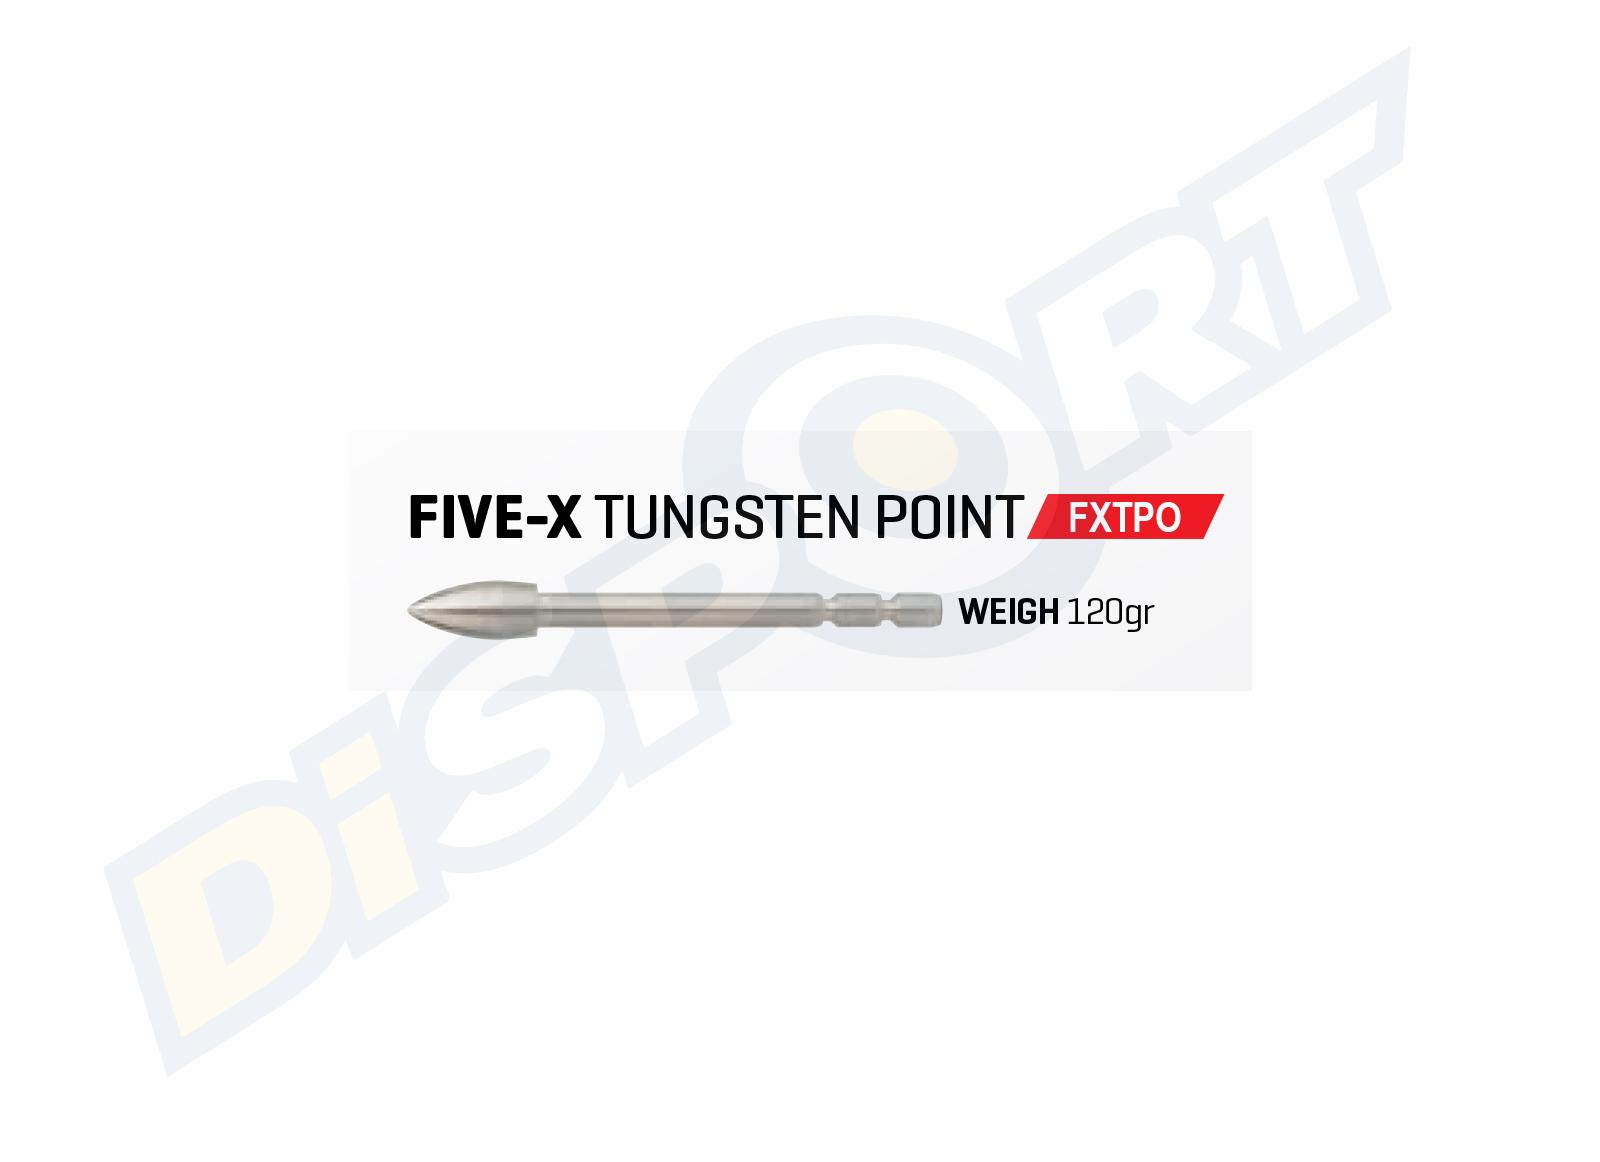 FIVICS PUNTA FIVE-X TUNGSTEN BREAK-OFF SET 12PZ